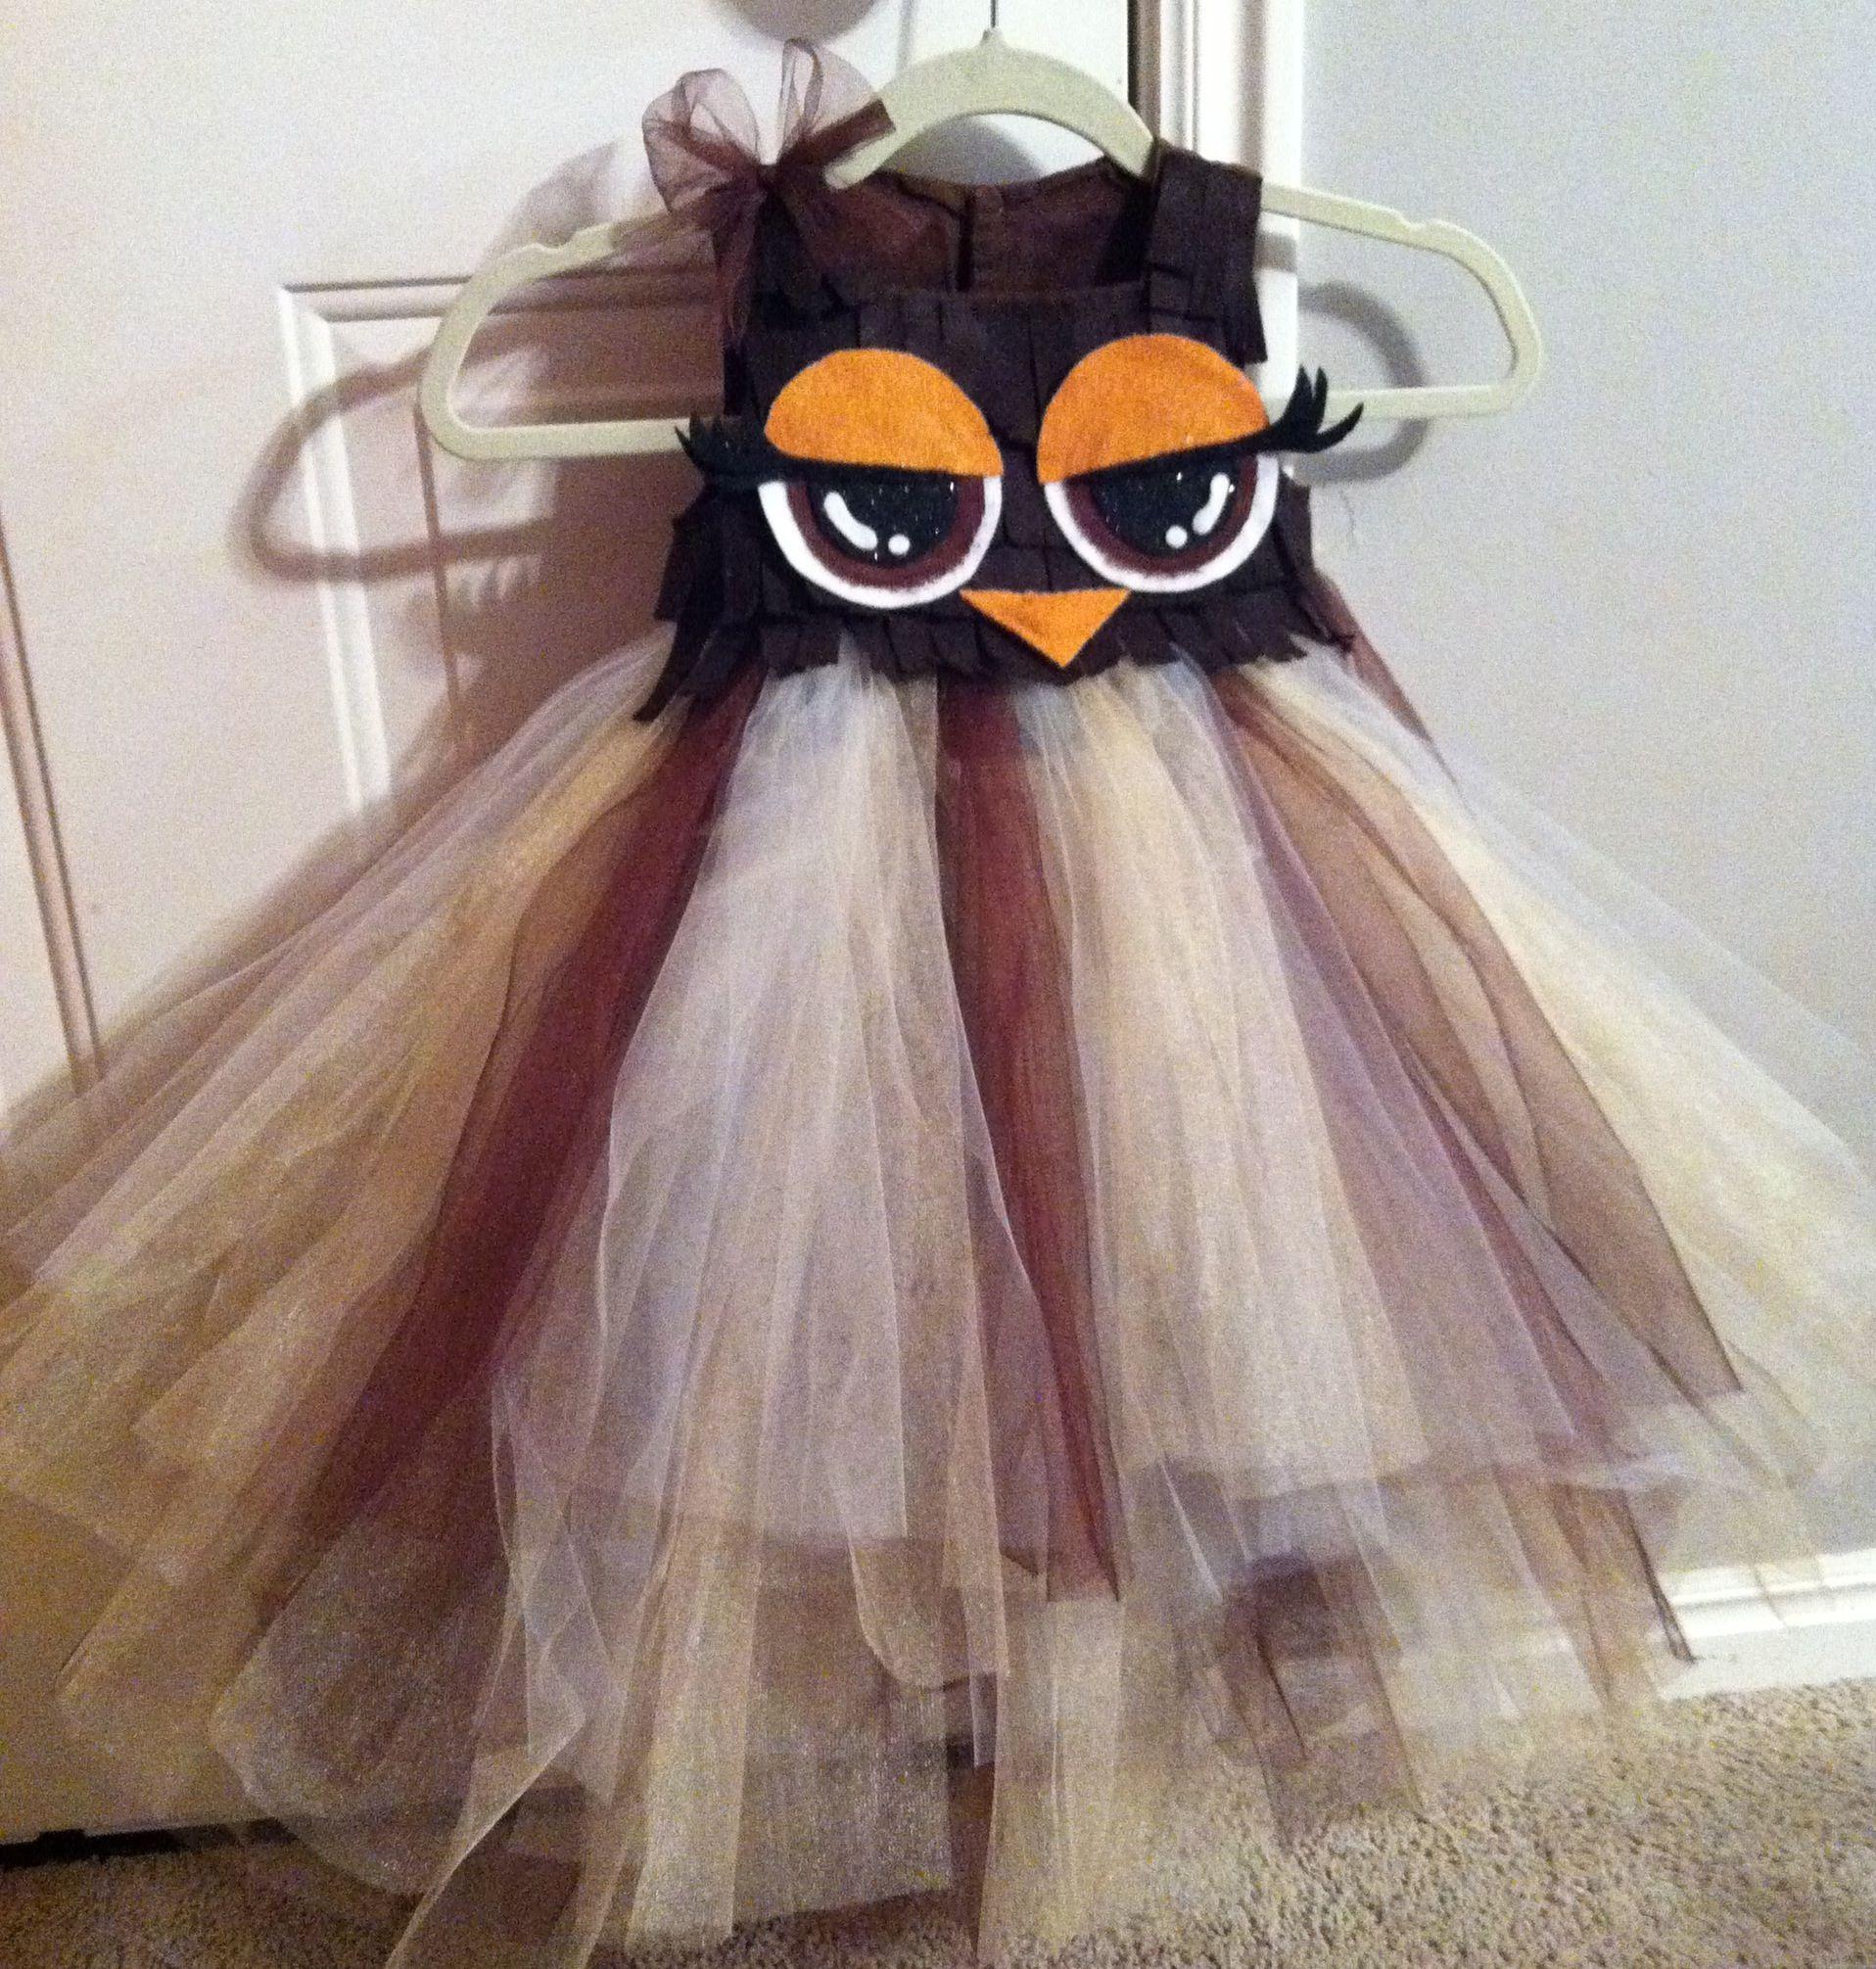 Toddler girl owl costume cute costumes pinterest costumes halloween ideas toddler girl owl costume solutioingenieria Images